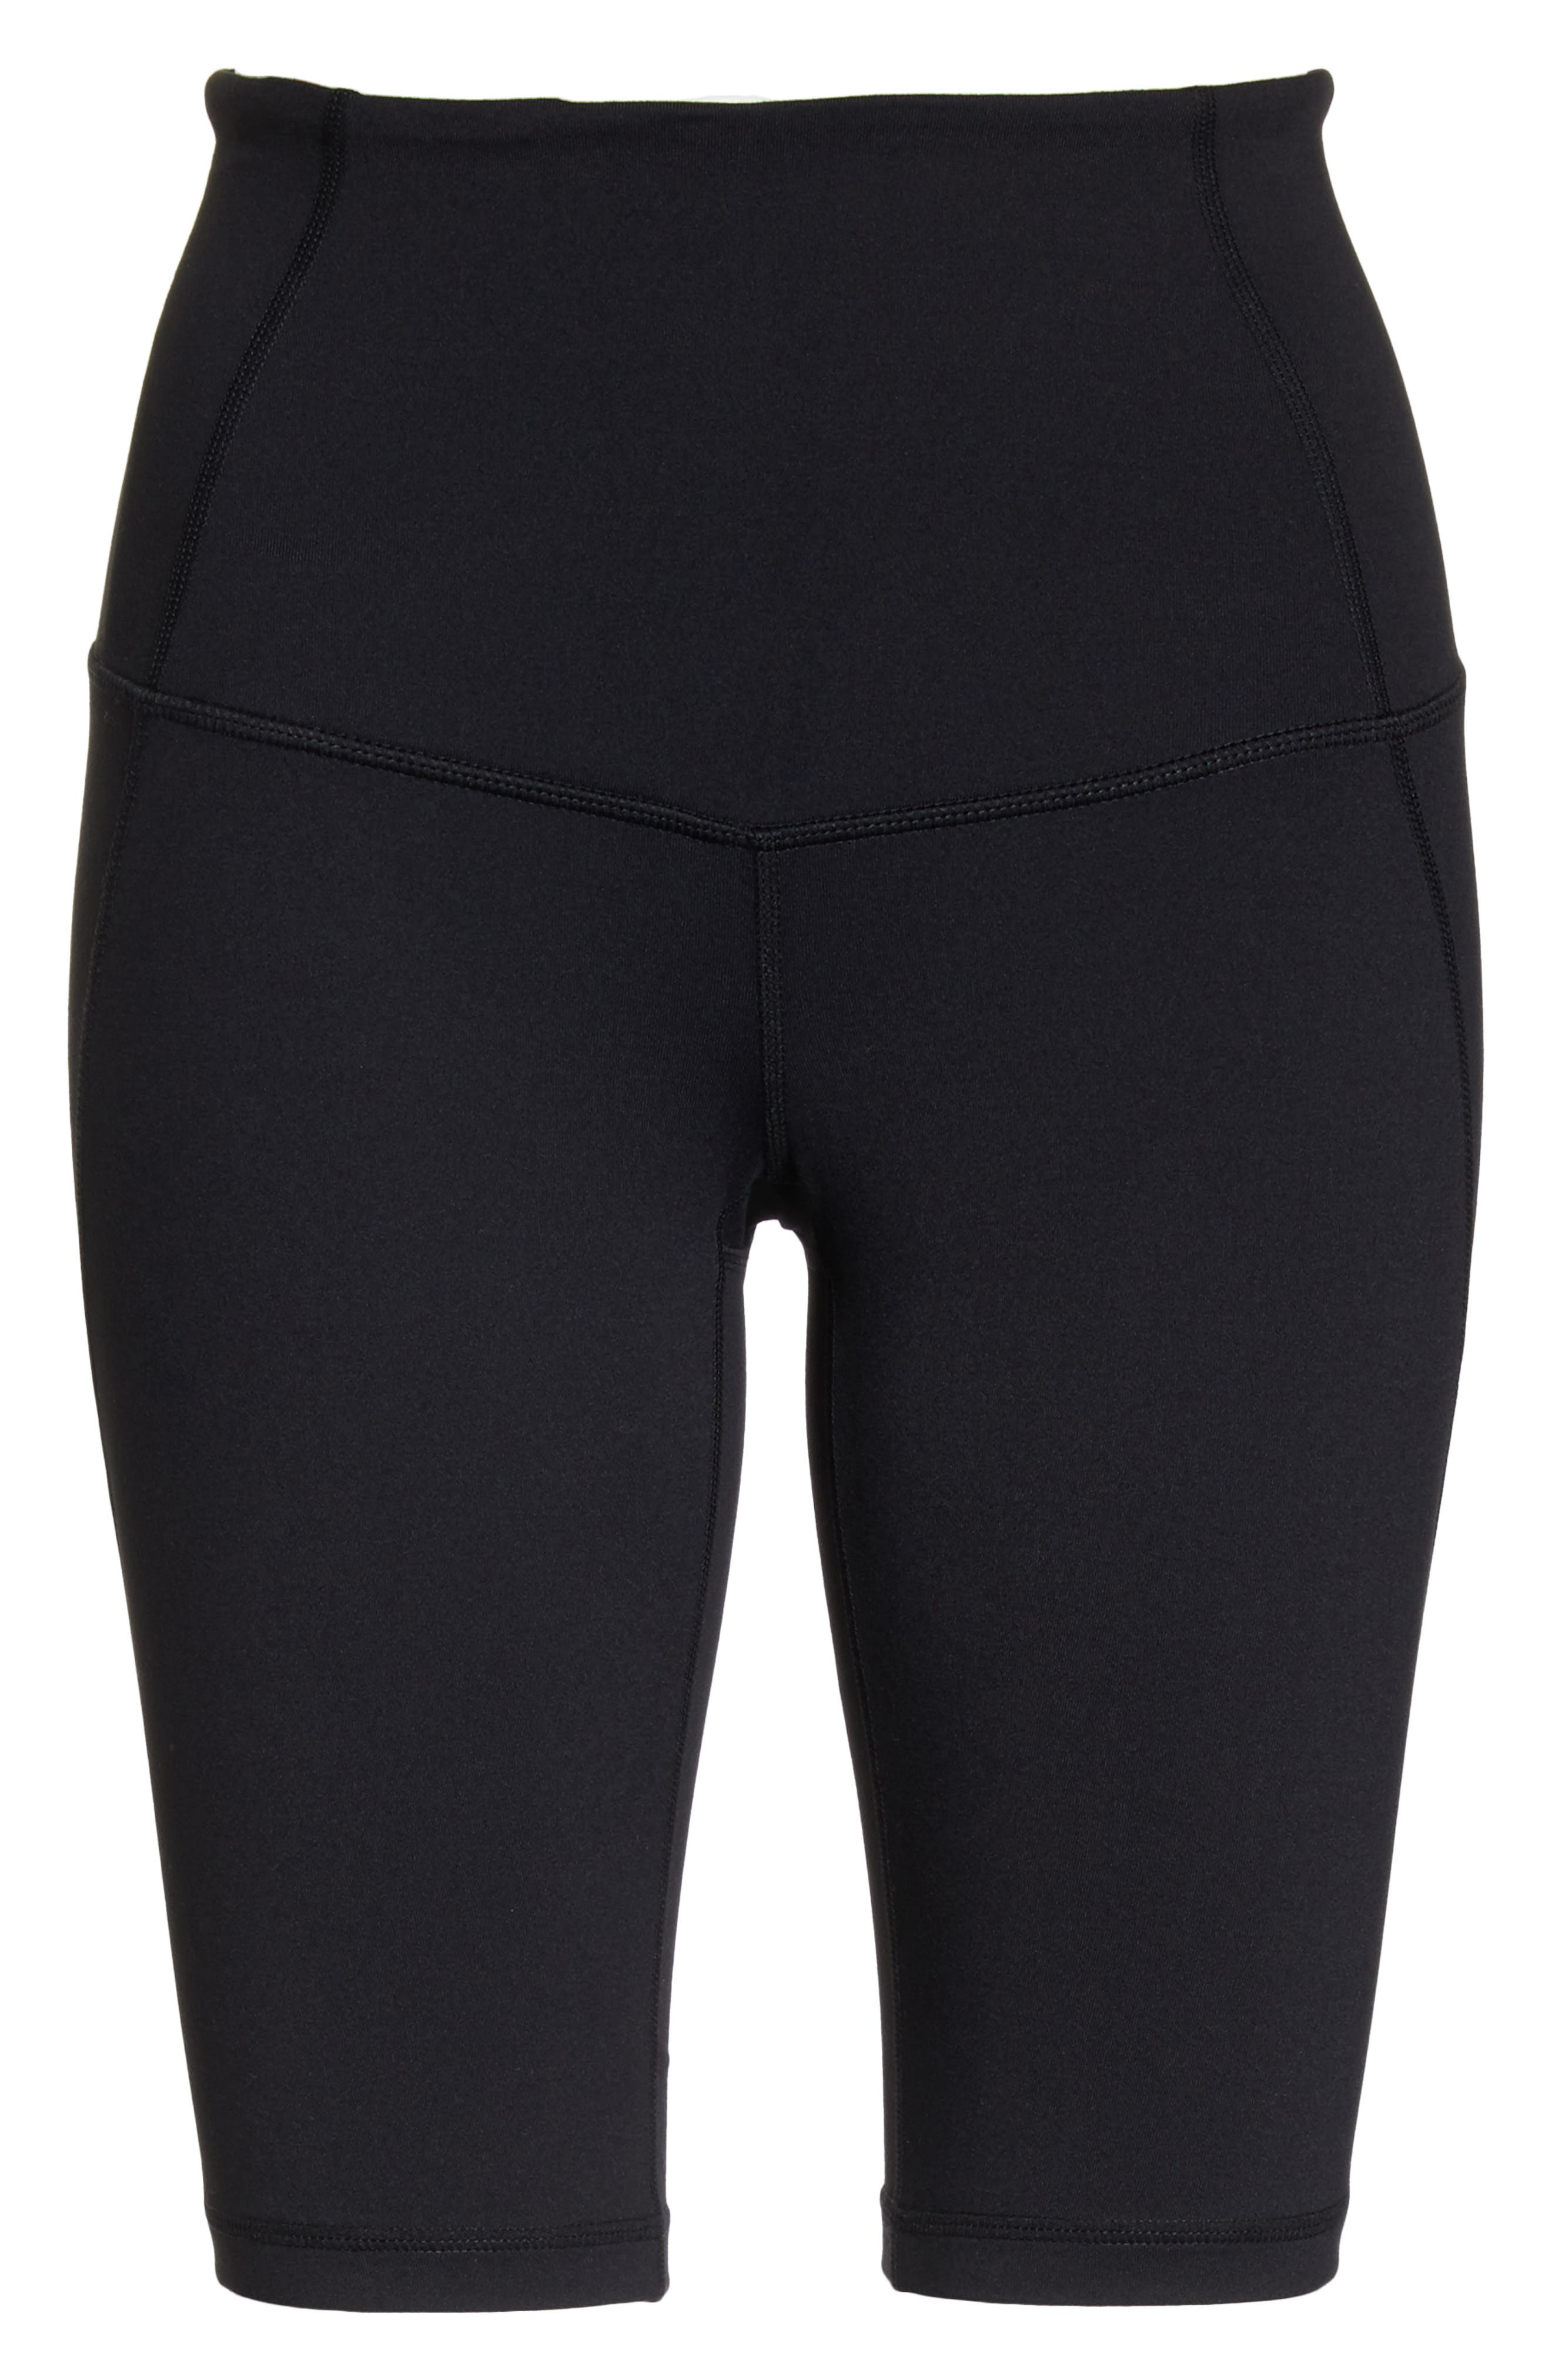 ZELLA, Hatha High Waist Bike Shorts, Alternate thumbnail 7, color, BLACK